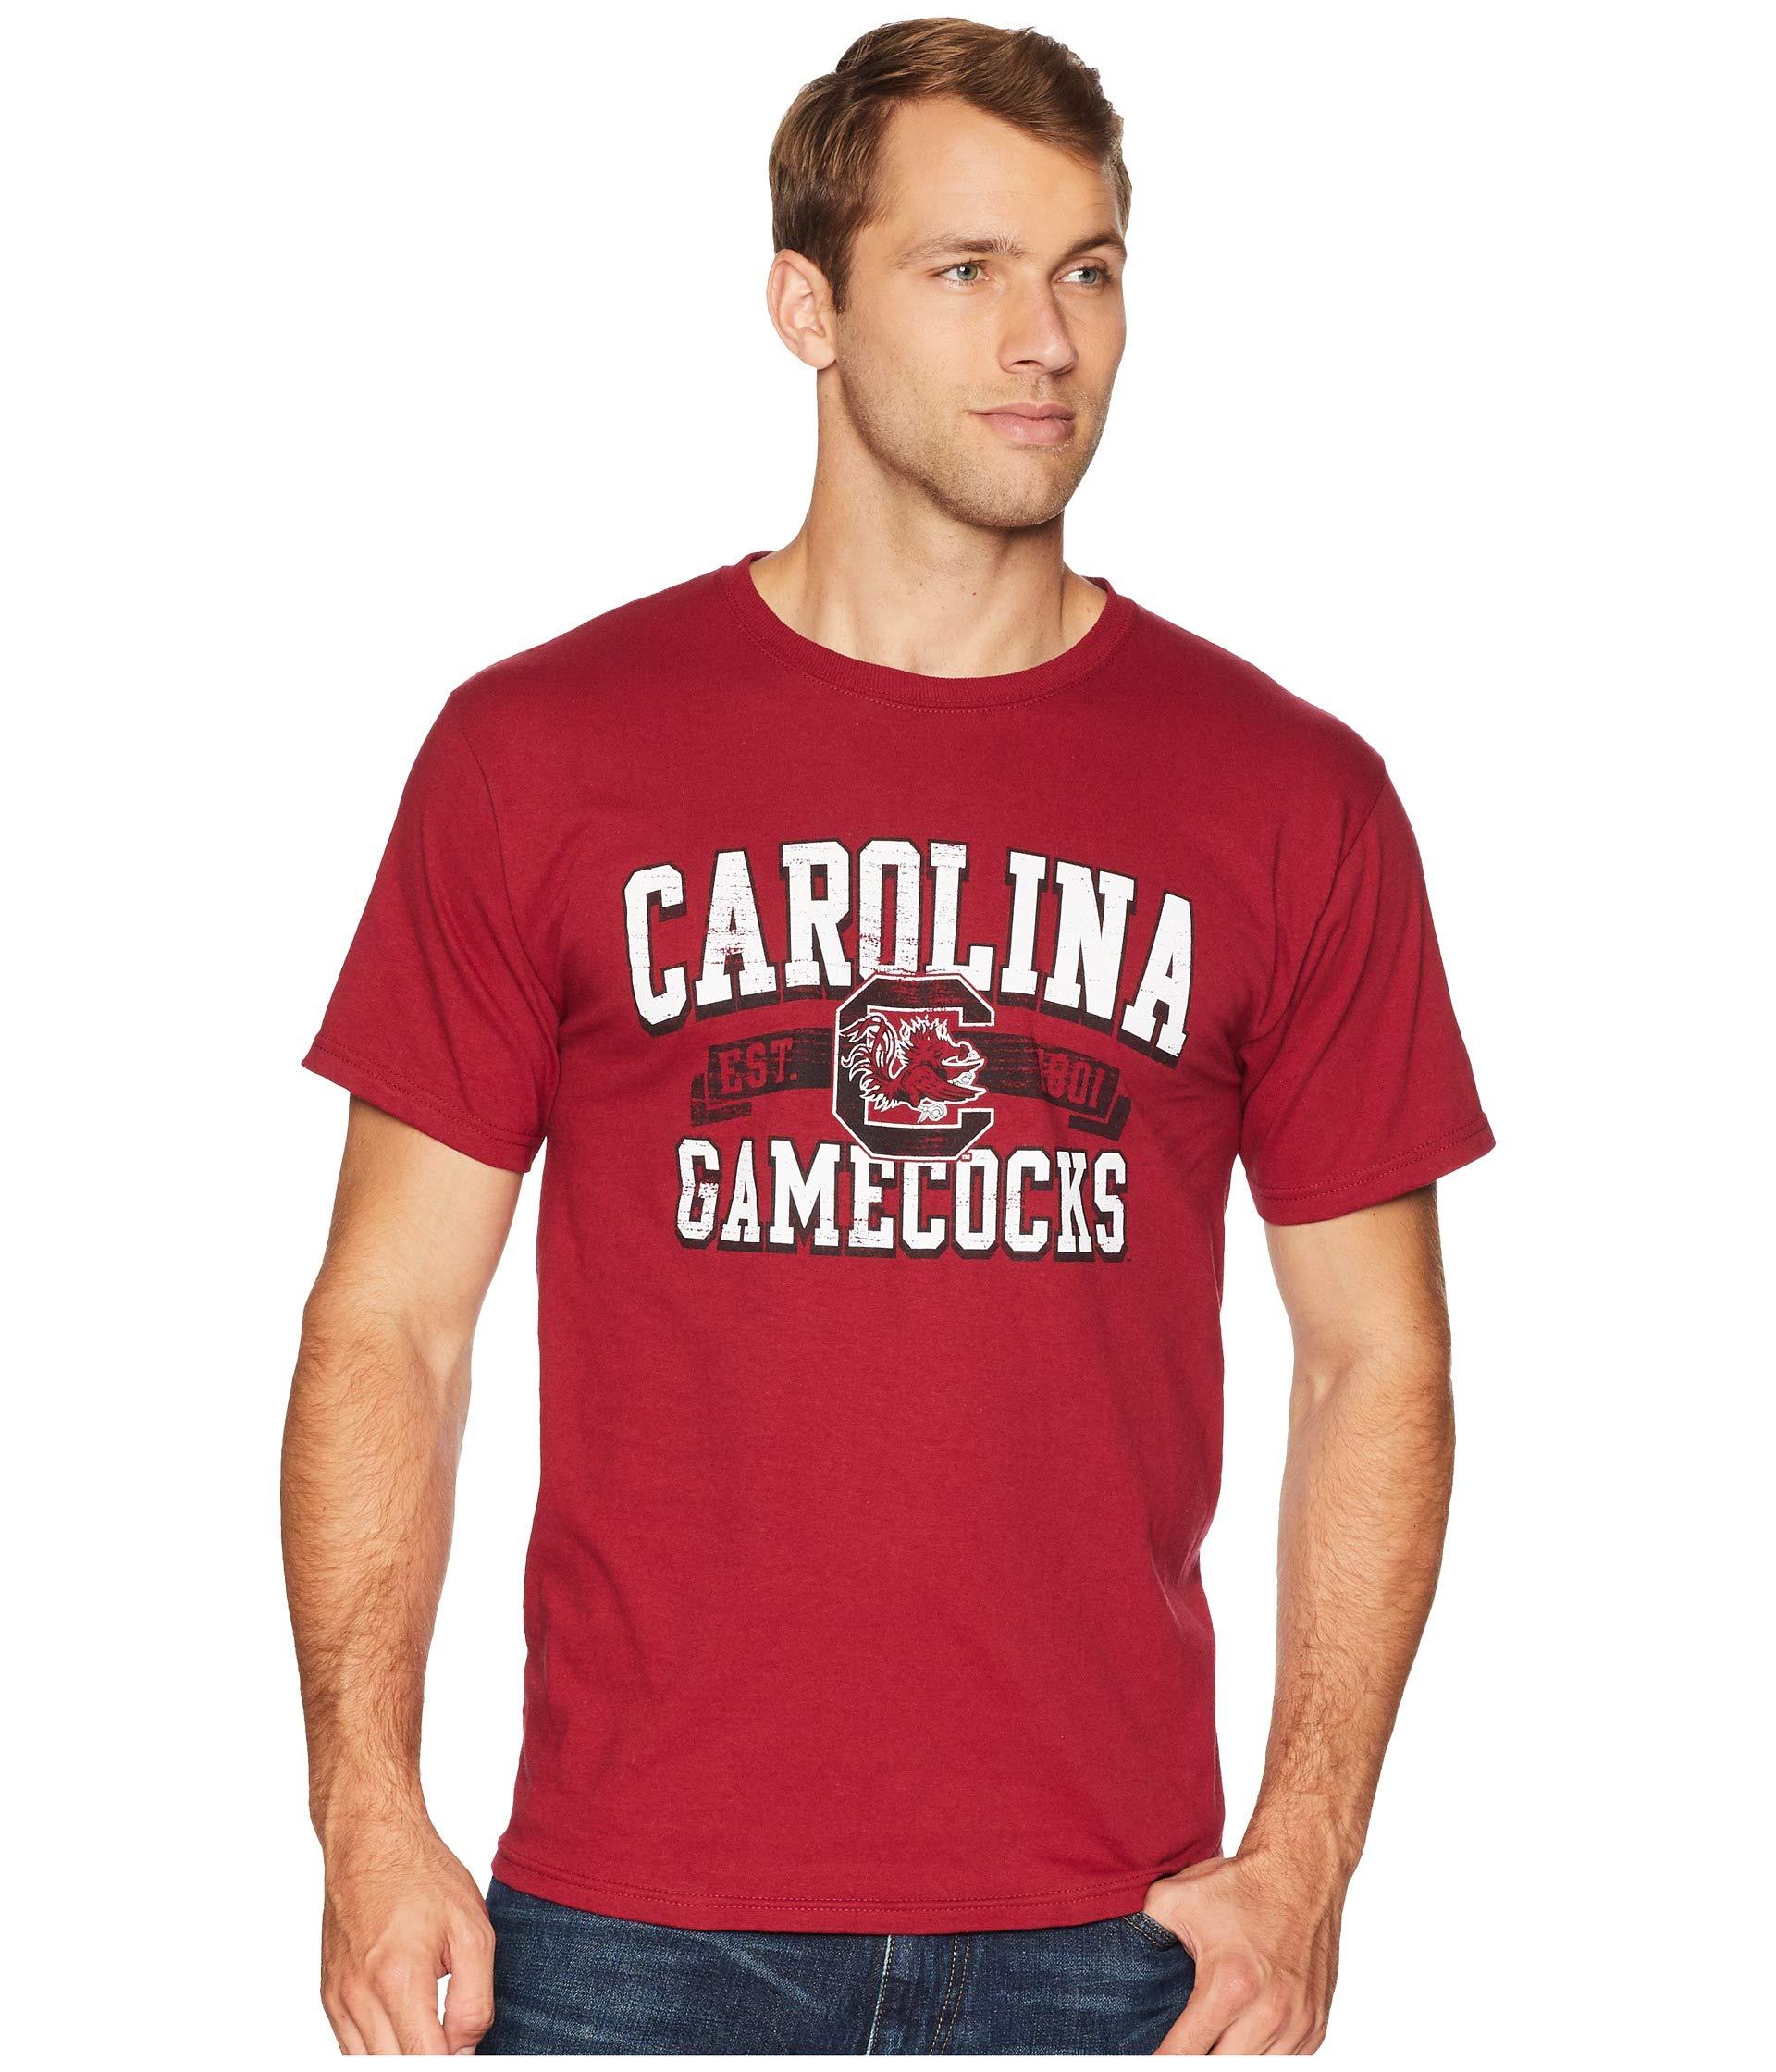 Champion College 1 Gamecocks Carolina South Tee Jersey Garnet O7xORwqr